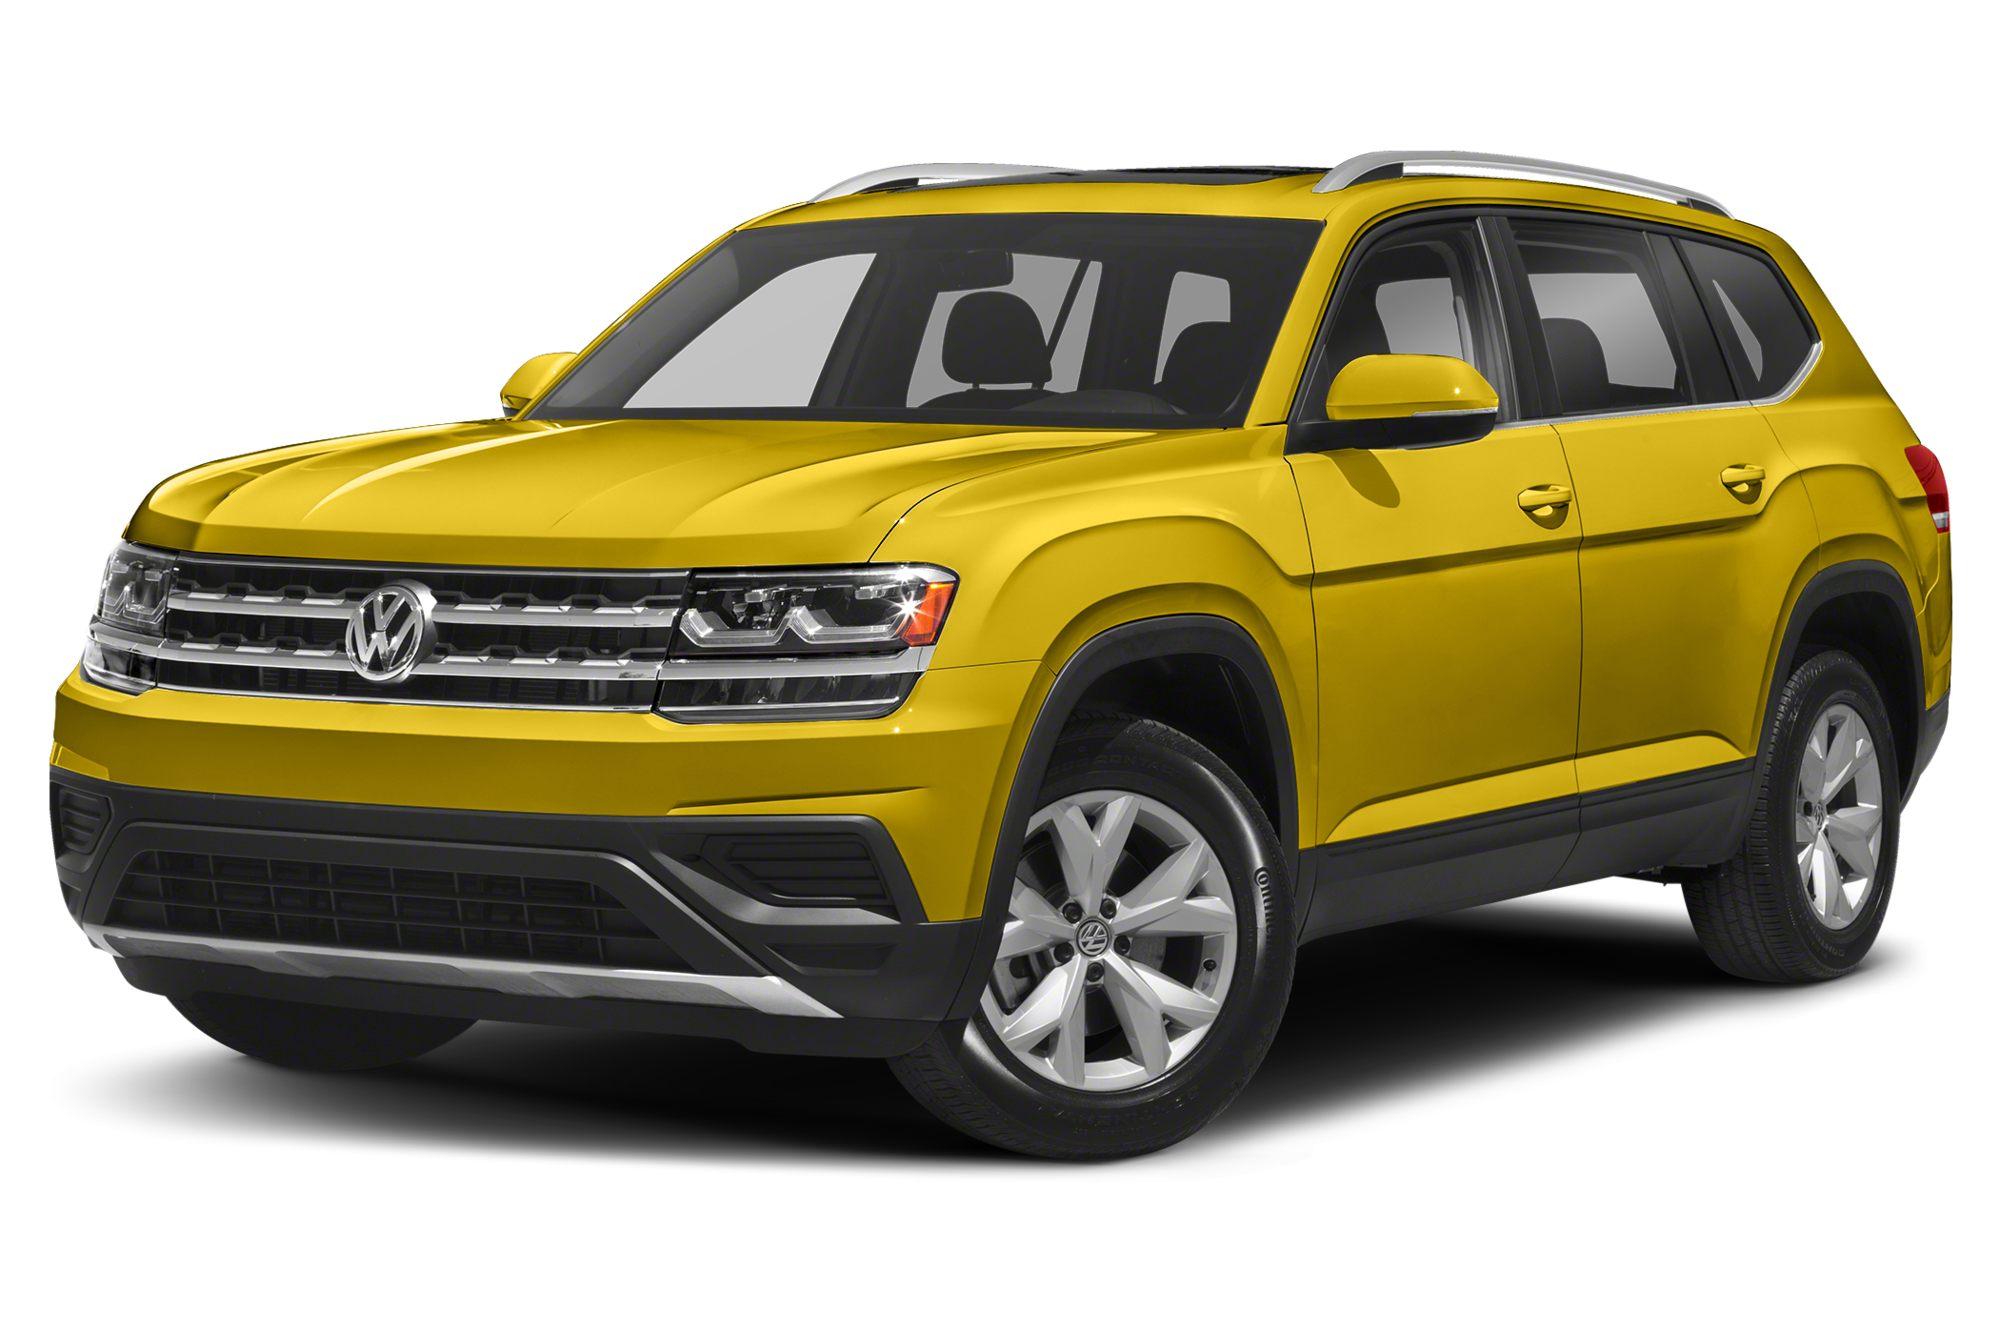 volkswagen-atlas-2018-front-three-quarter-oem